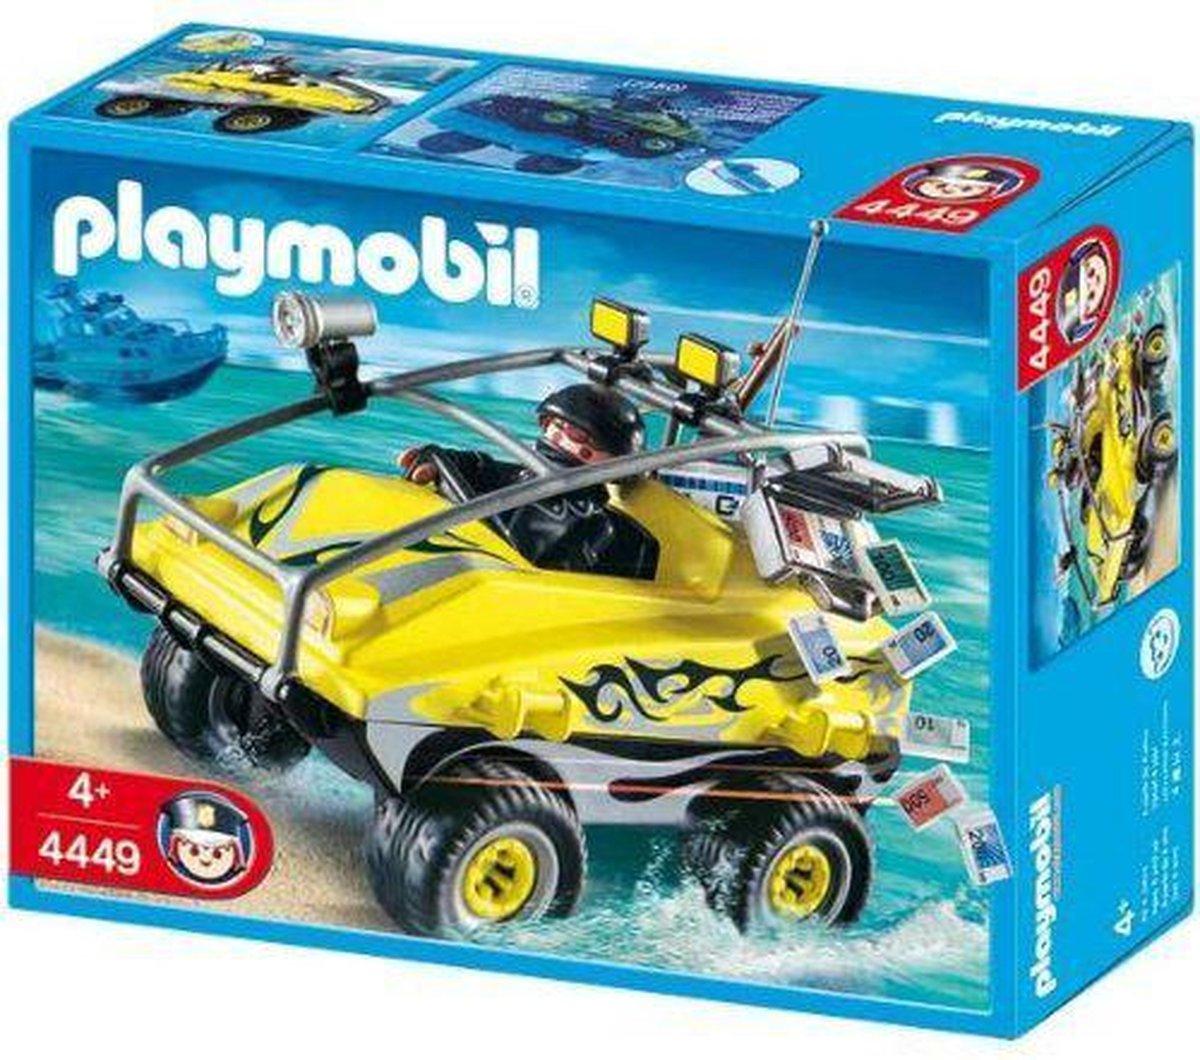 Playmobil Amfibievoertuig - 4449